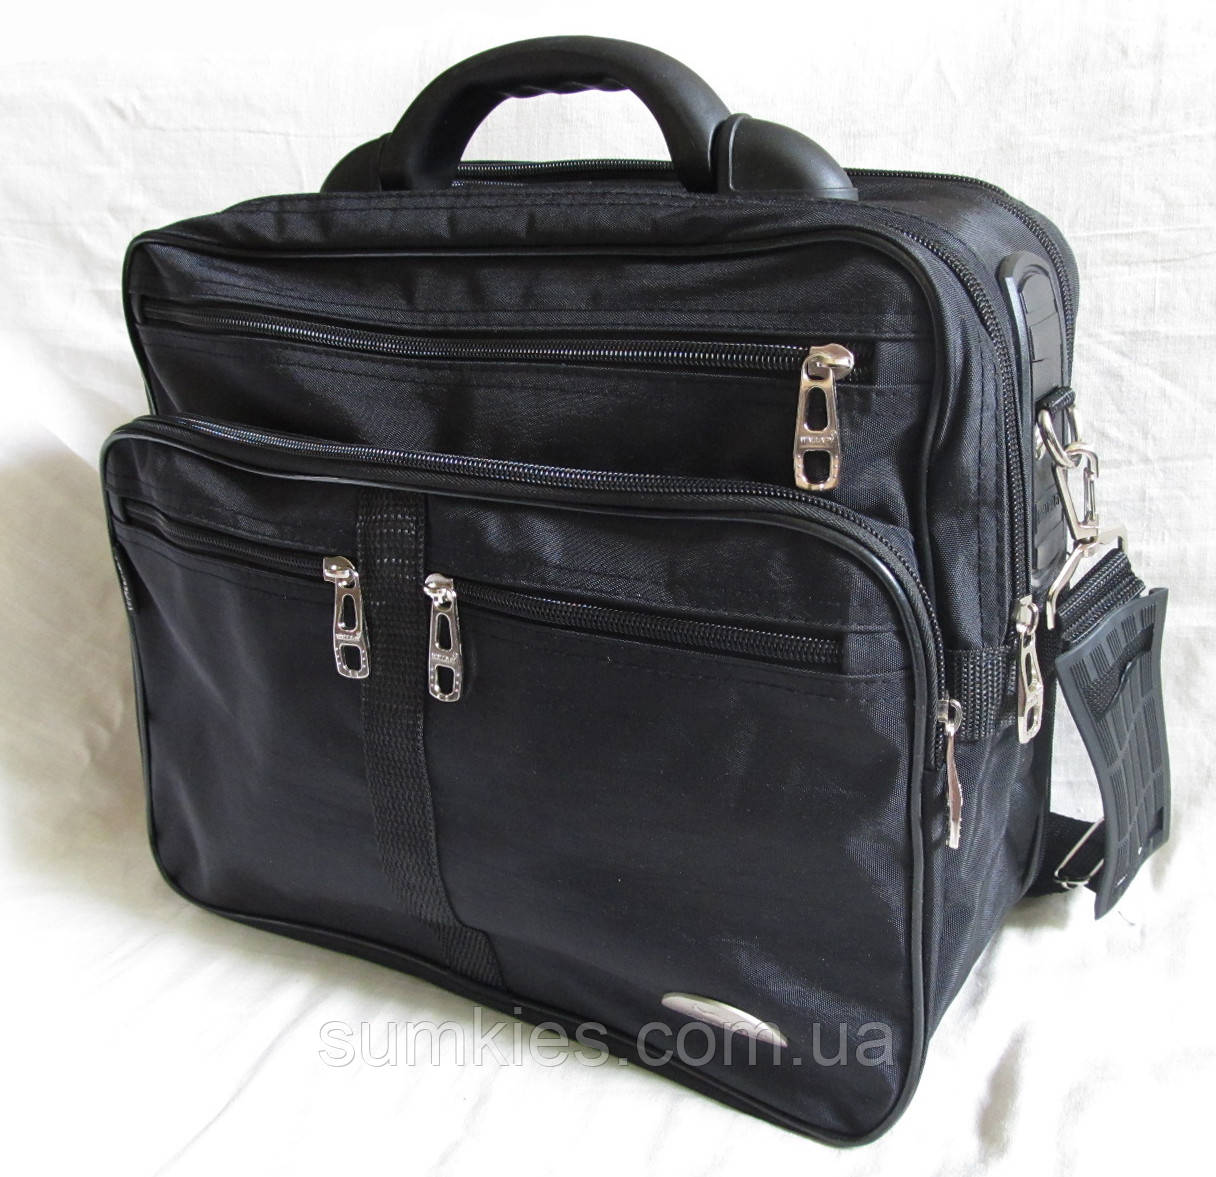 e976182b573a Мужская сумка Wallaby 25275 черная полукаркасная с расширением через плечо  папка портфель А4 35х29х20+3см